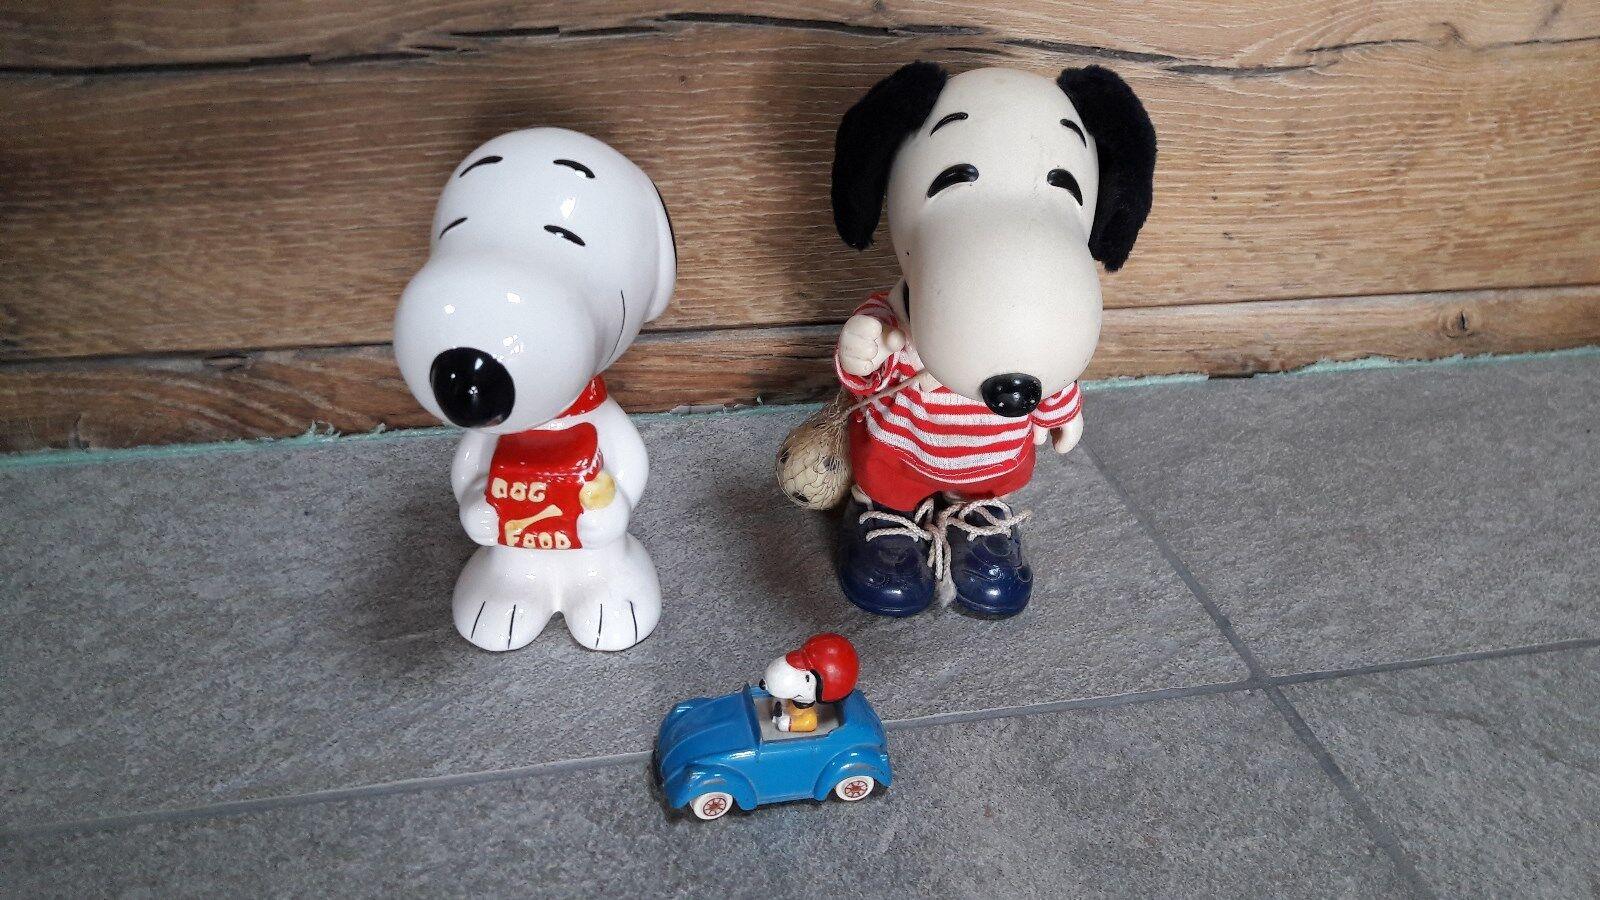 Lot Snoopy tirelire porcelaine figurine foot voiture ESCI vintage peanuts coin